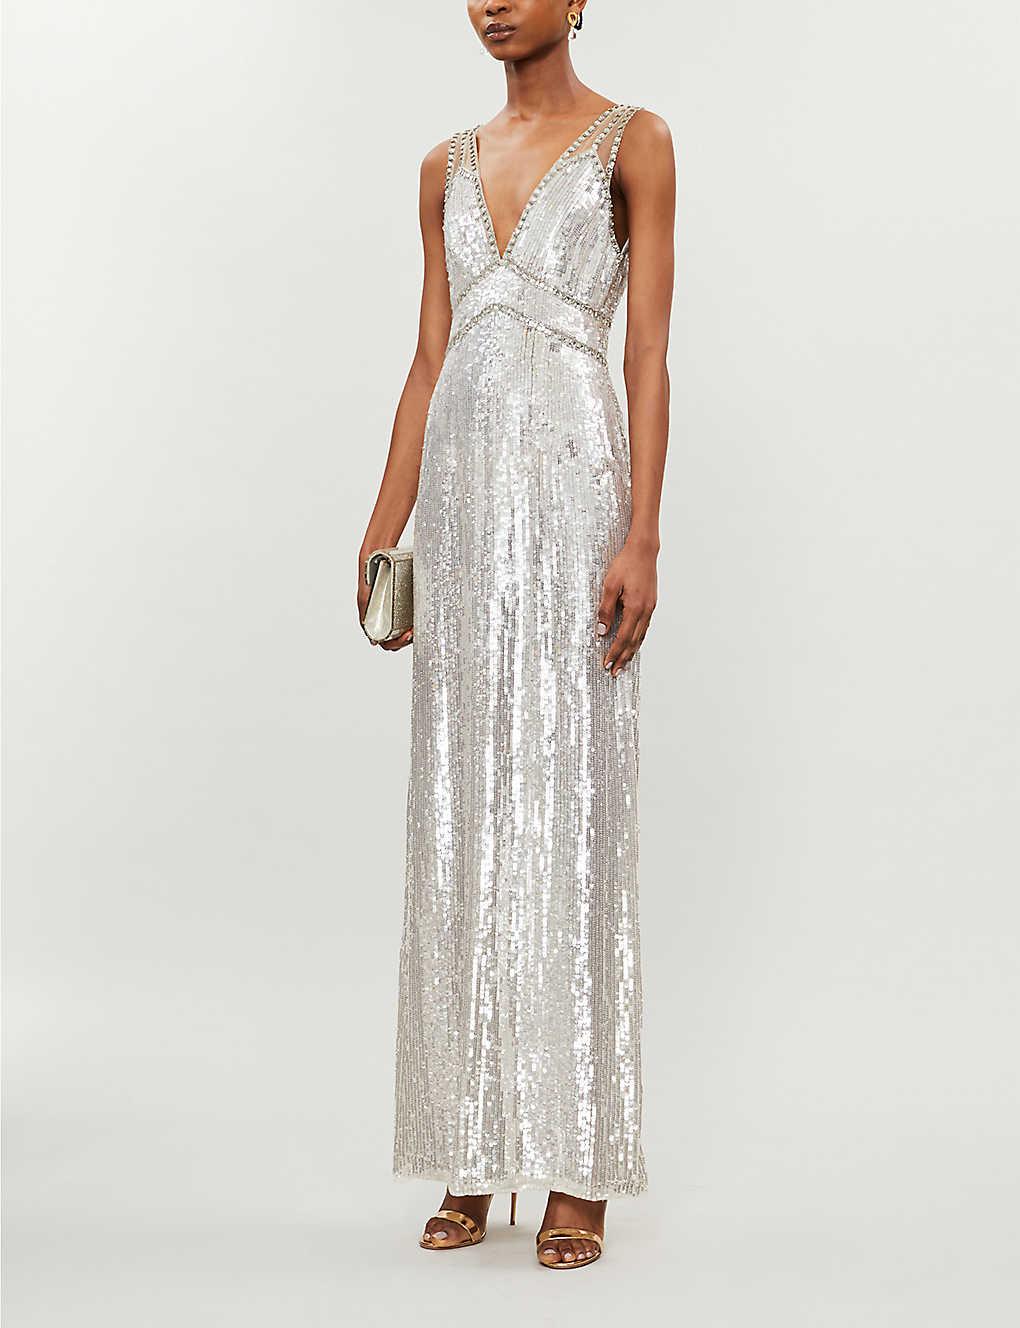 JENNY PACKHAM Valencia V-neck Embellished Gown